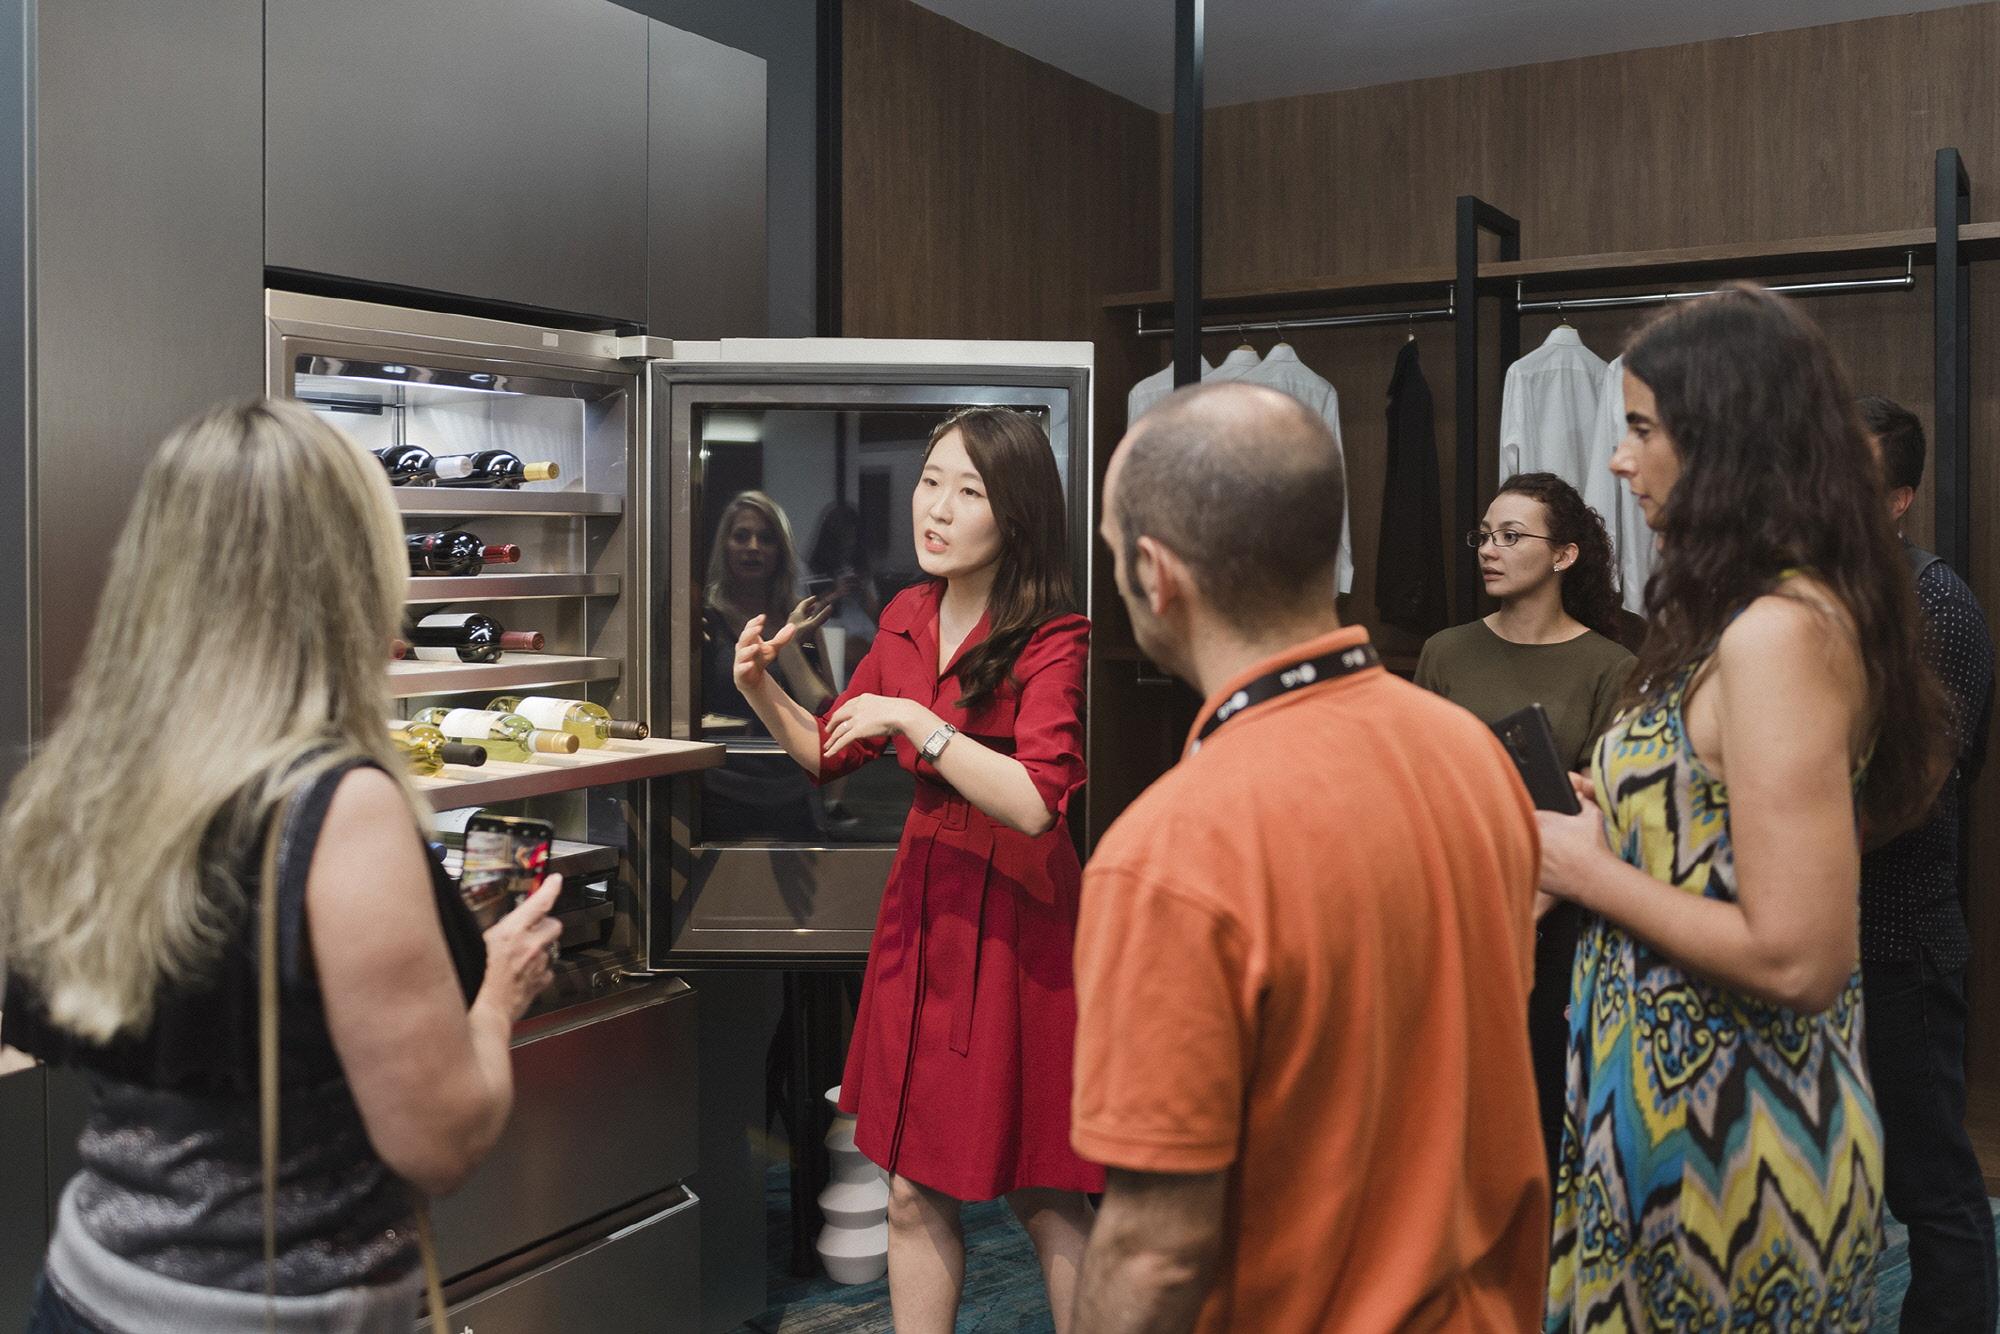 LG전자가 3일부터 사흘간 중남미 20개국의 거래선, 외신기자 등 약 150명을 미국 올랜도에 초청해 'LG 이노페스트(LG InnoFest)'를 열었다. LG 이노페스트 참가자들이 고객들의 라이프스타일을 반영한 공간 솔루션을 체험하고 있다